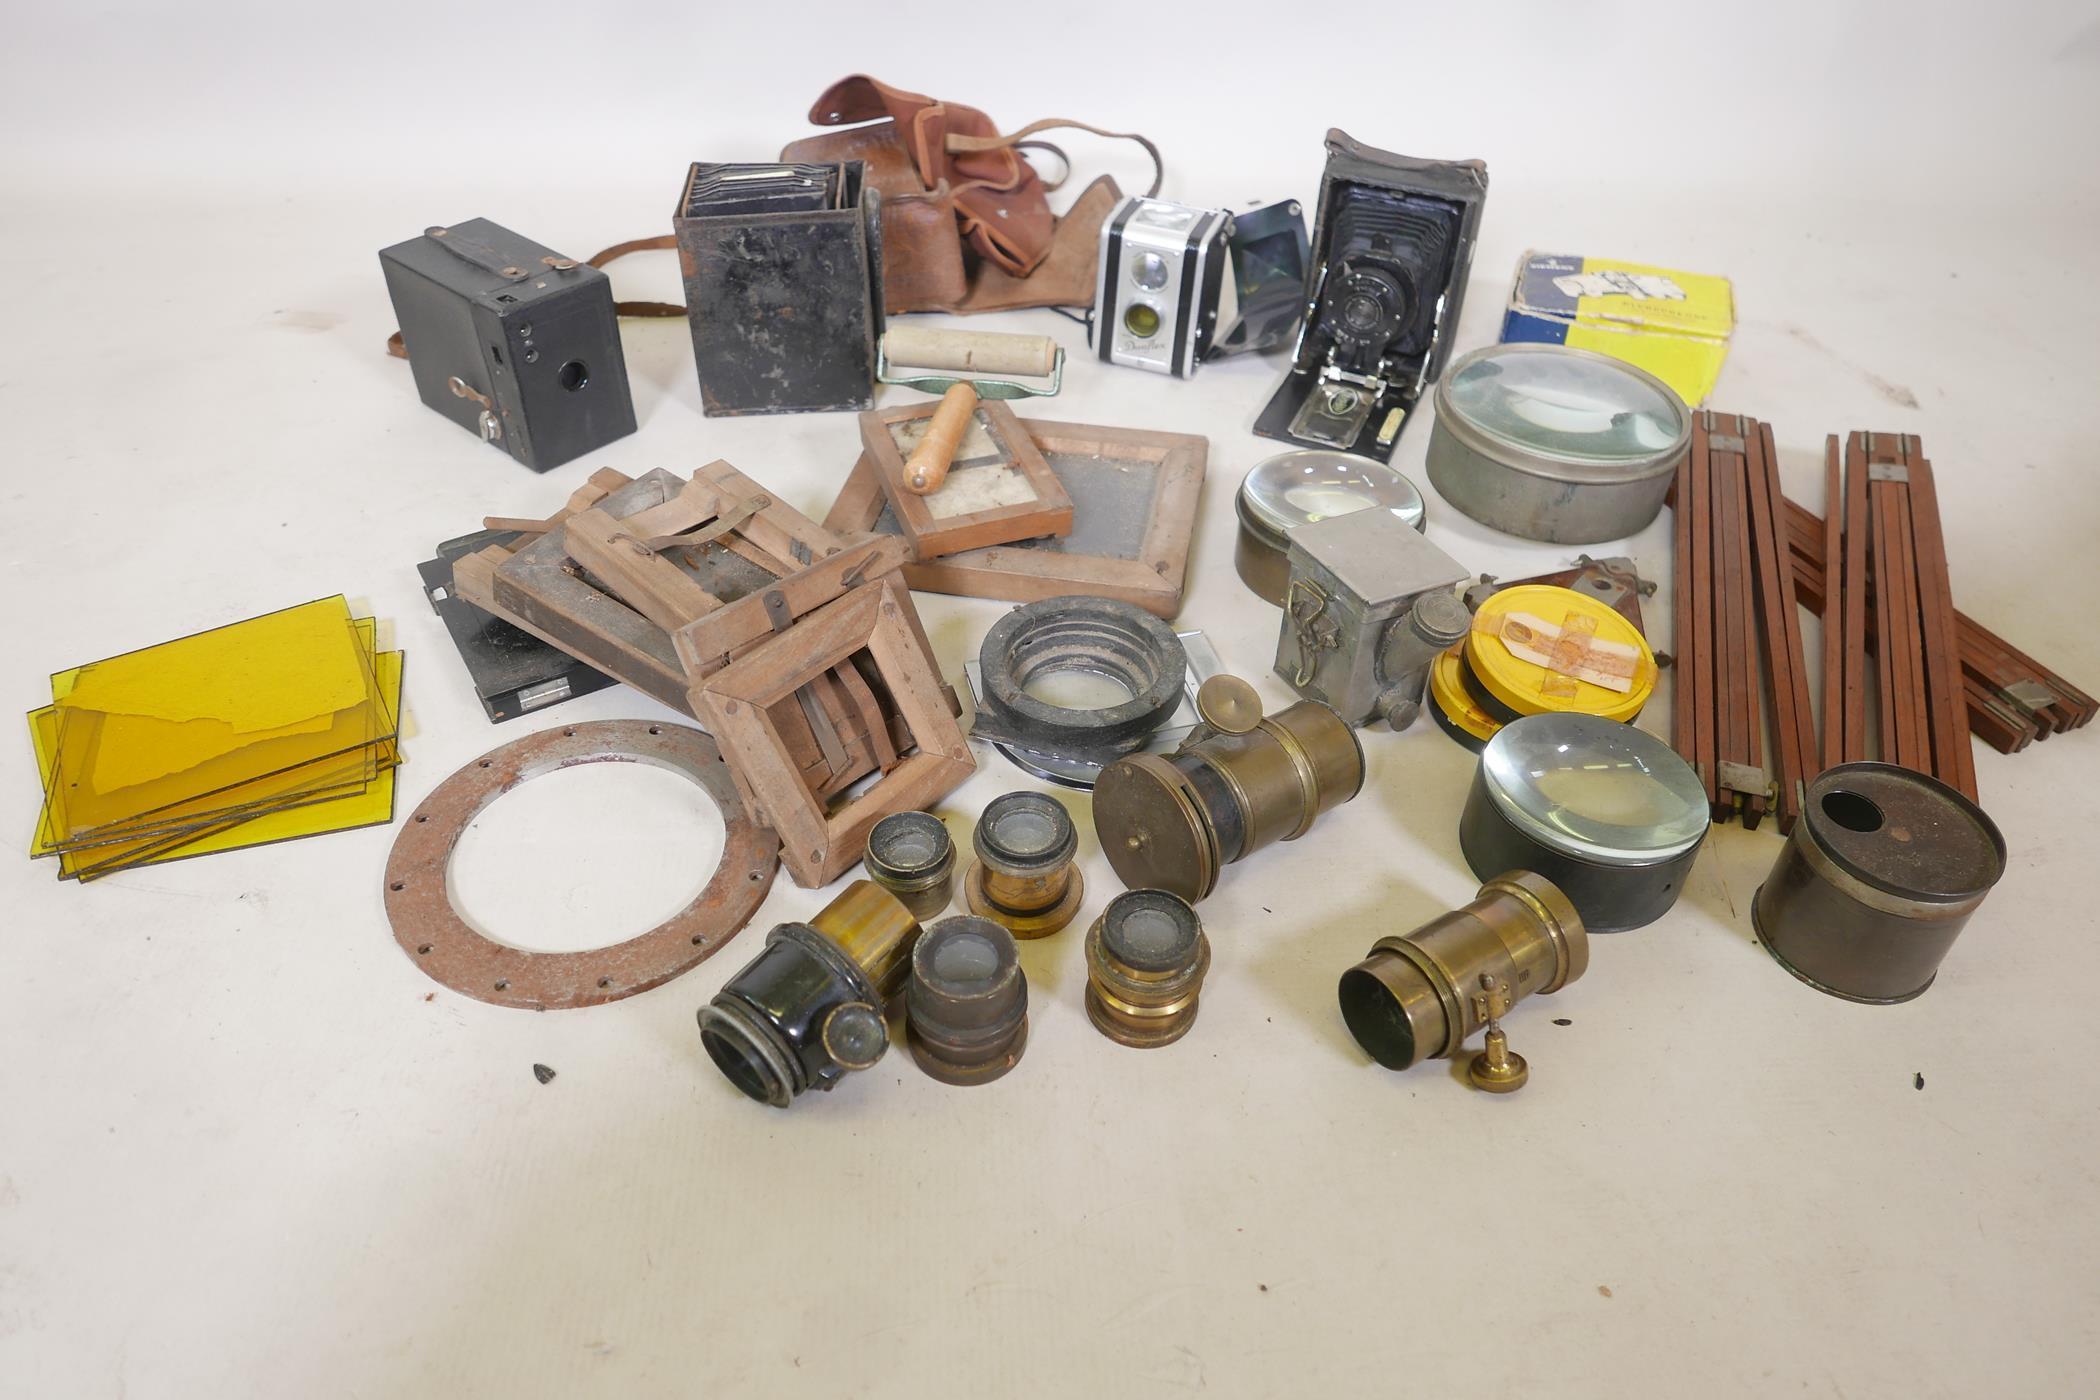 A quantity of antique photography equipment, Engsign Klito, Kodak Duaflex, No2 Hawkeye Model B,